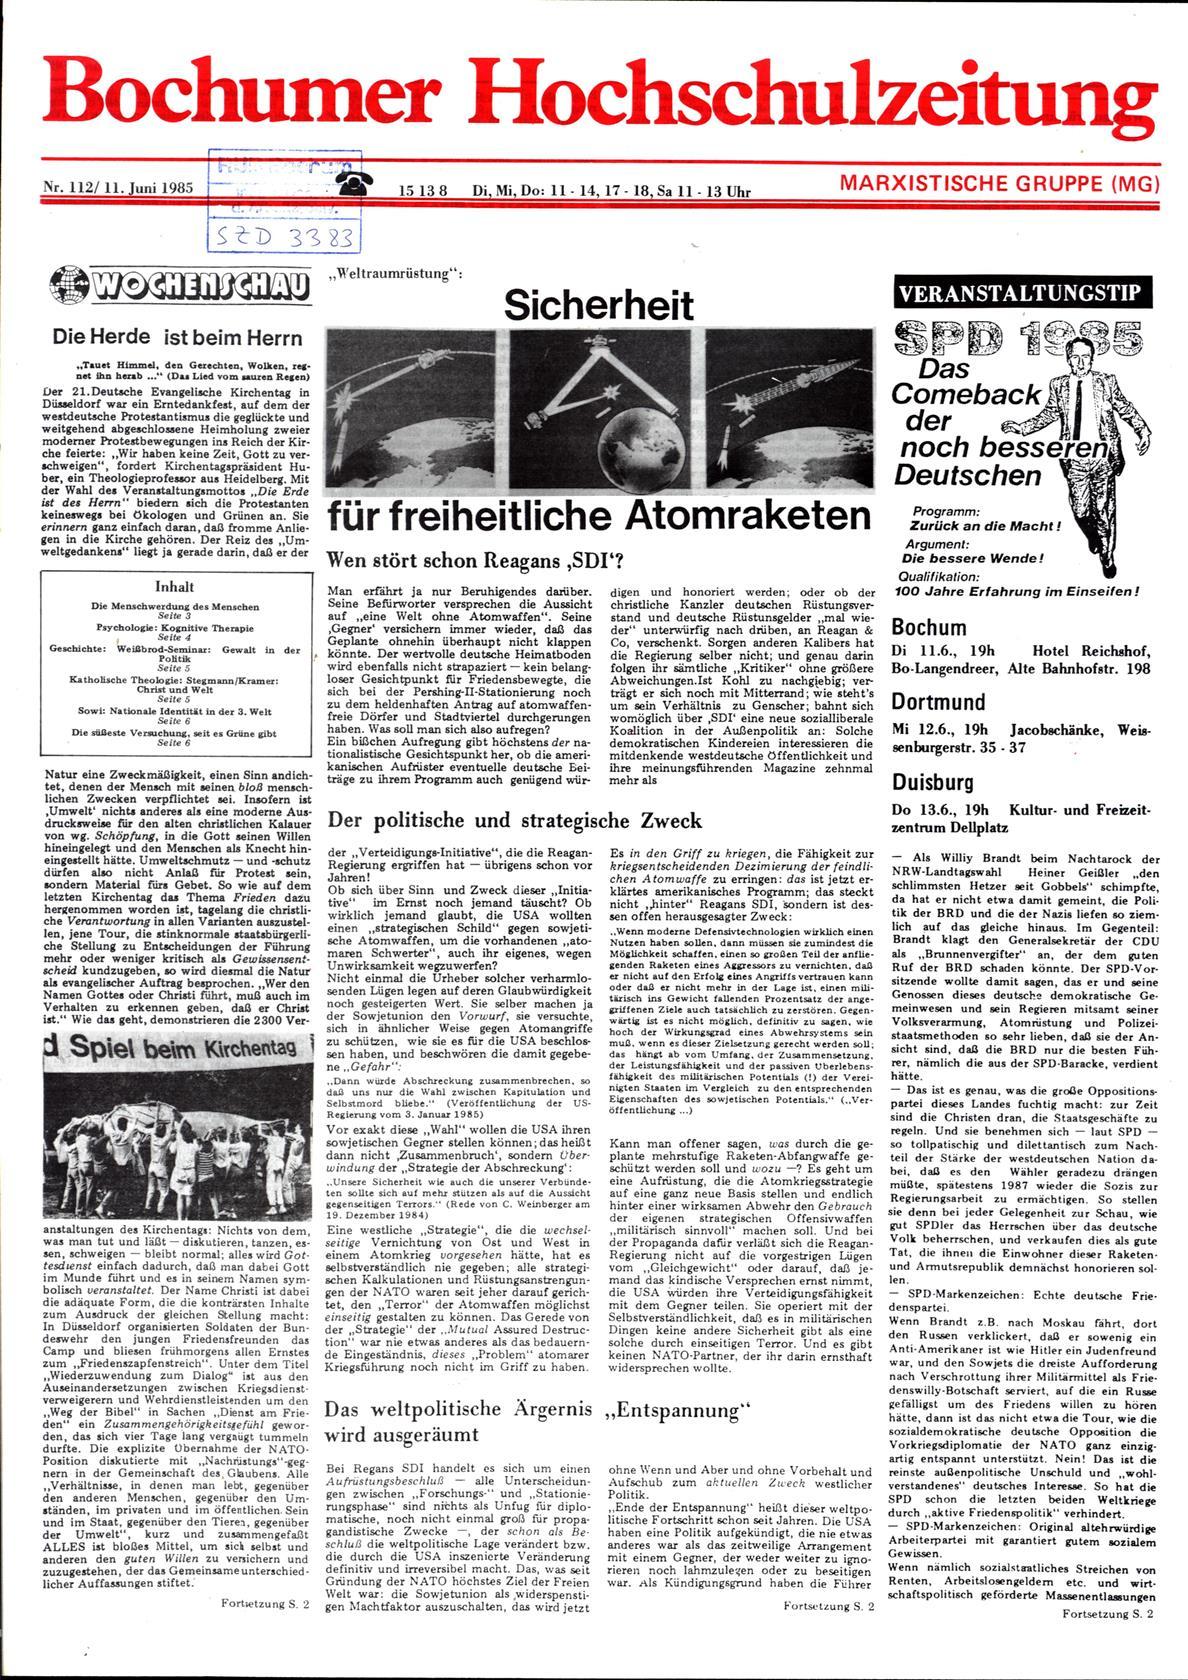 Bochum_BHZ_19850611_112_001